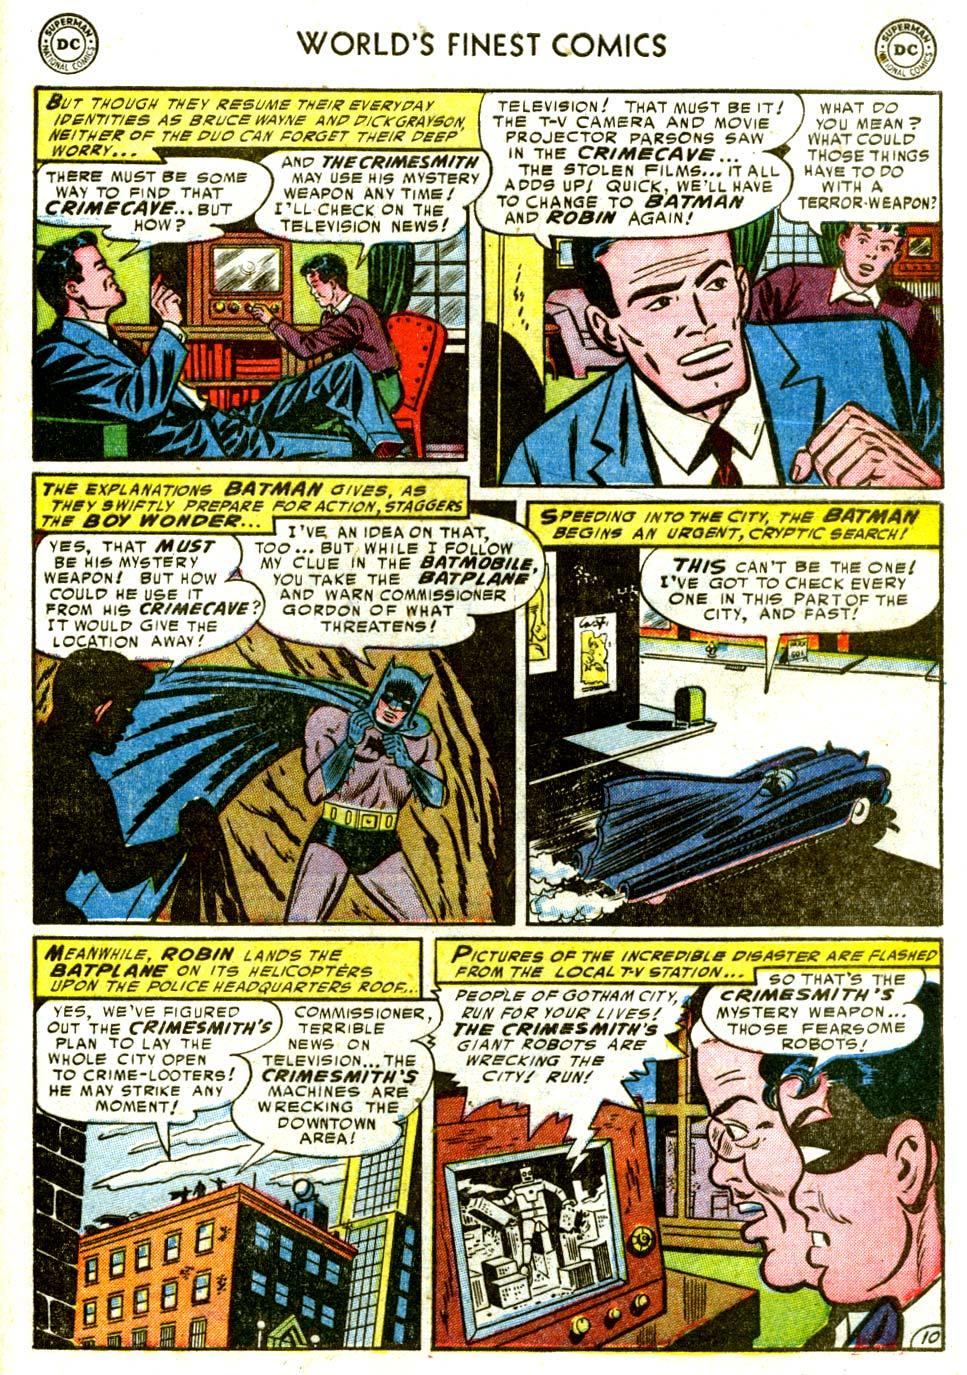 Read online World's Finest Comics comic -  Issue #68 - 63